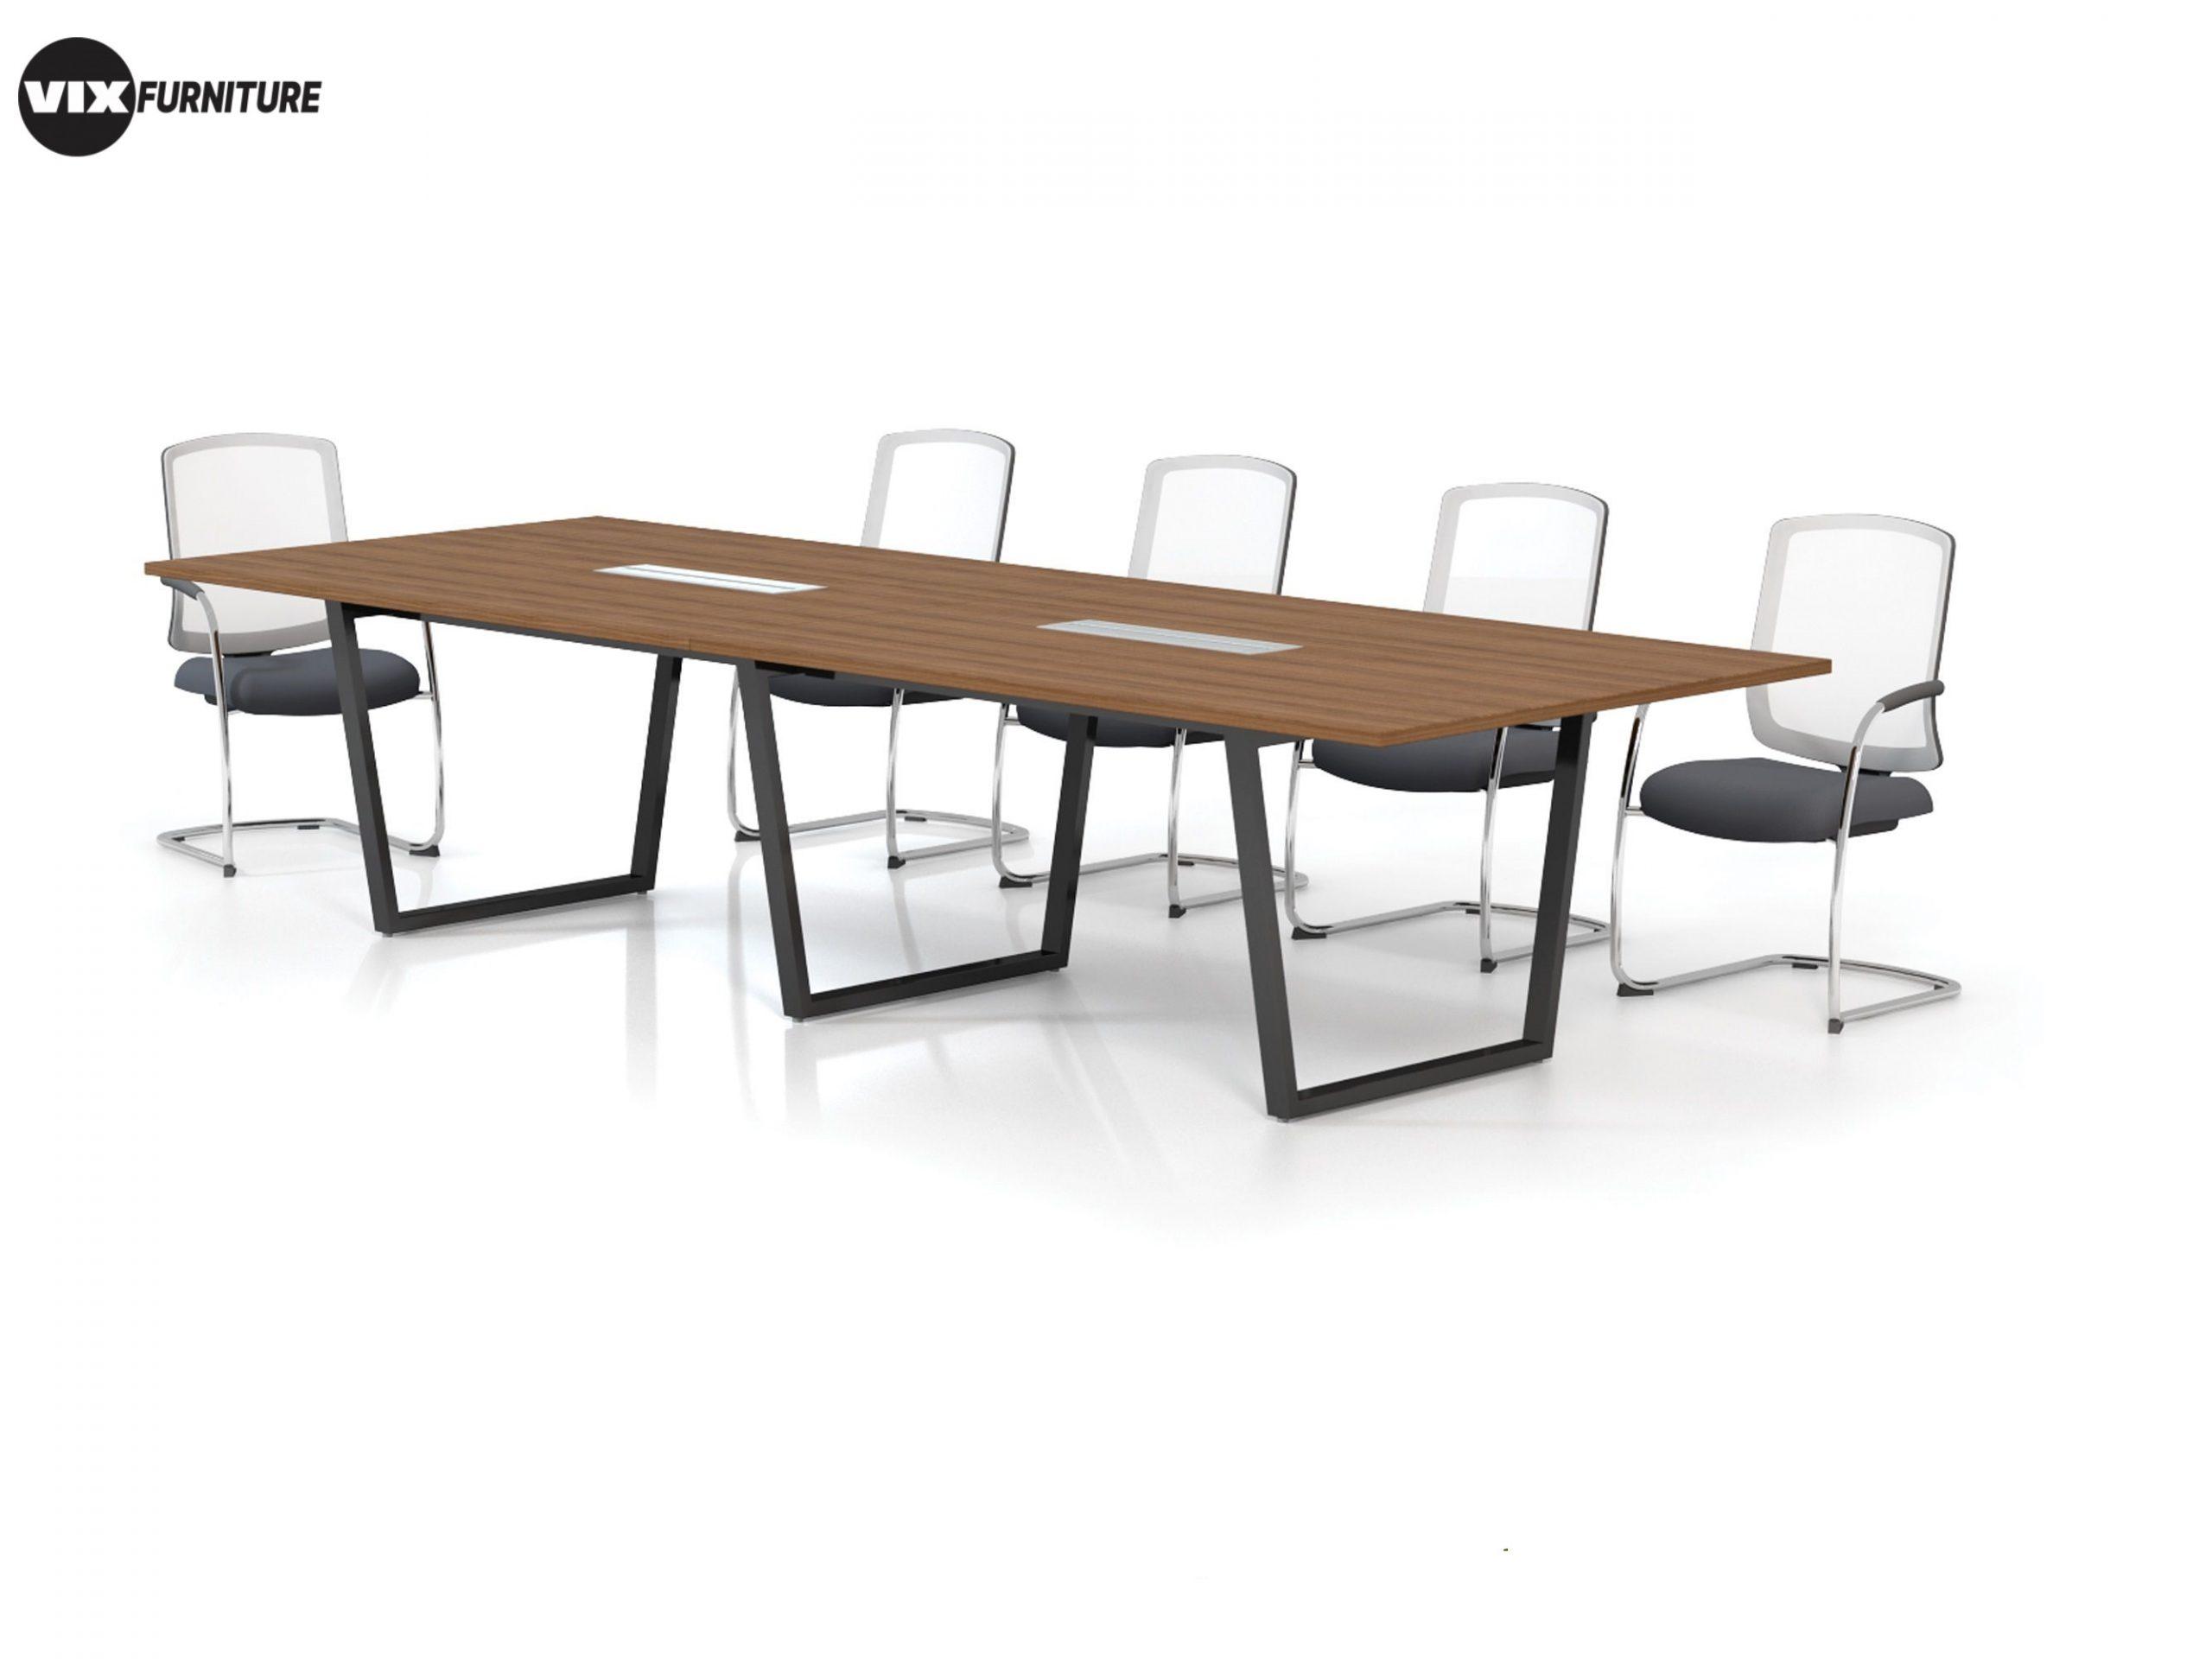 Vix meeting table BH15